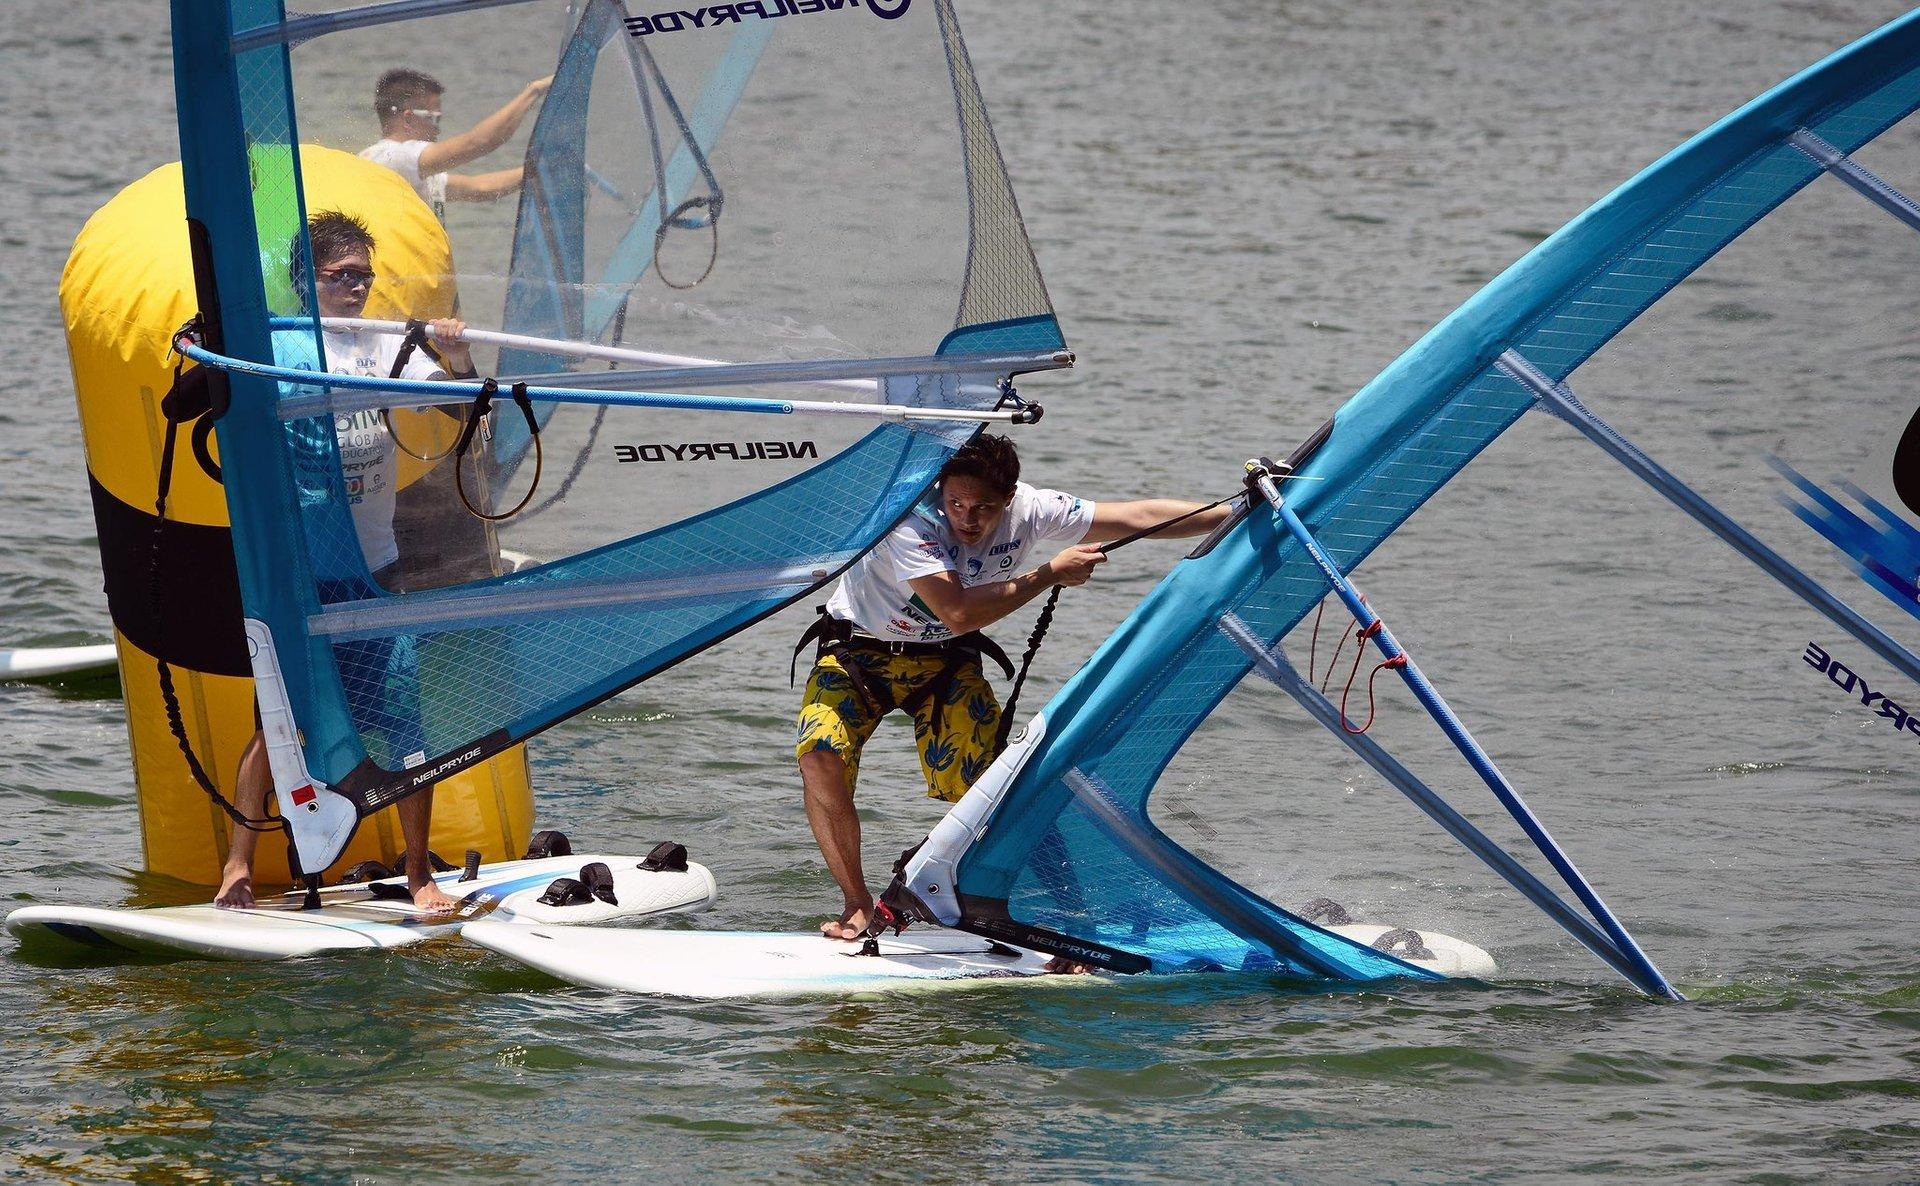 Kitesurfing and Windsurfing  in Singapore - Best Season 2020